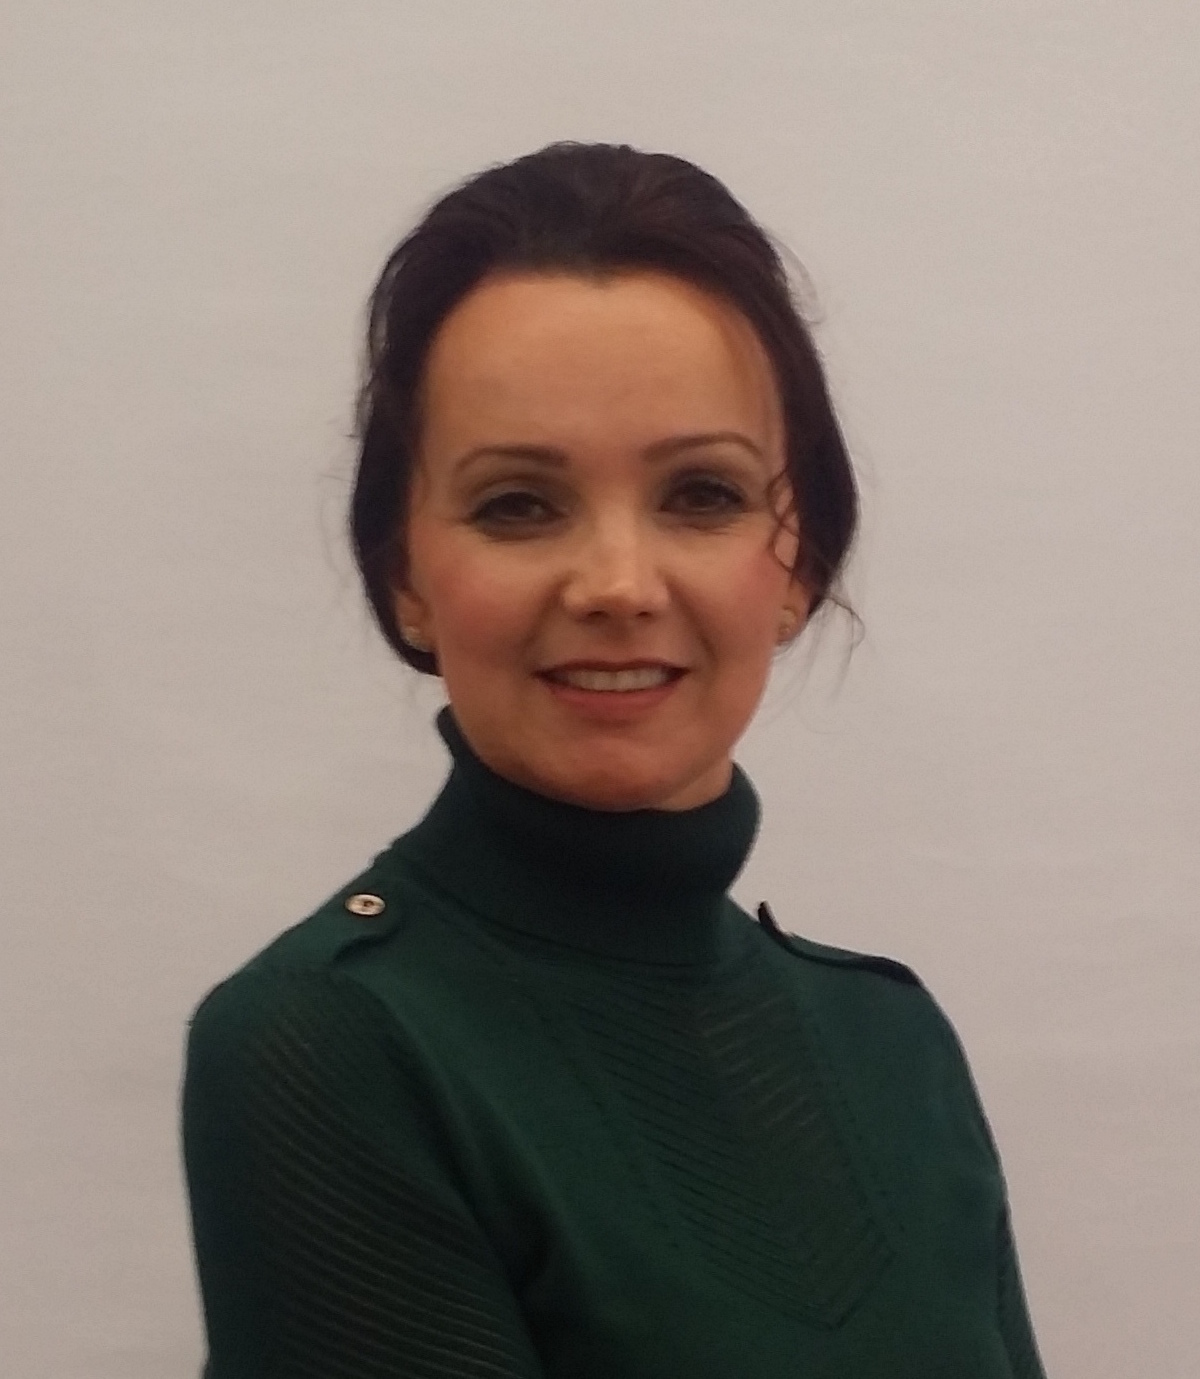 Milena Mechkova, MBA H&R Block